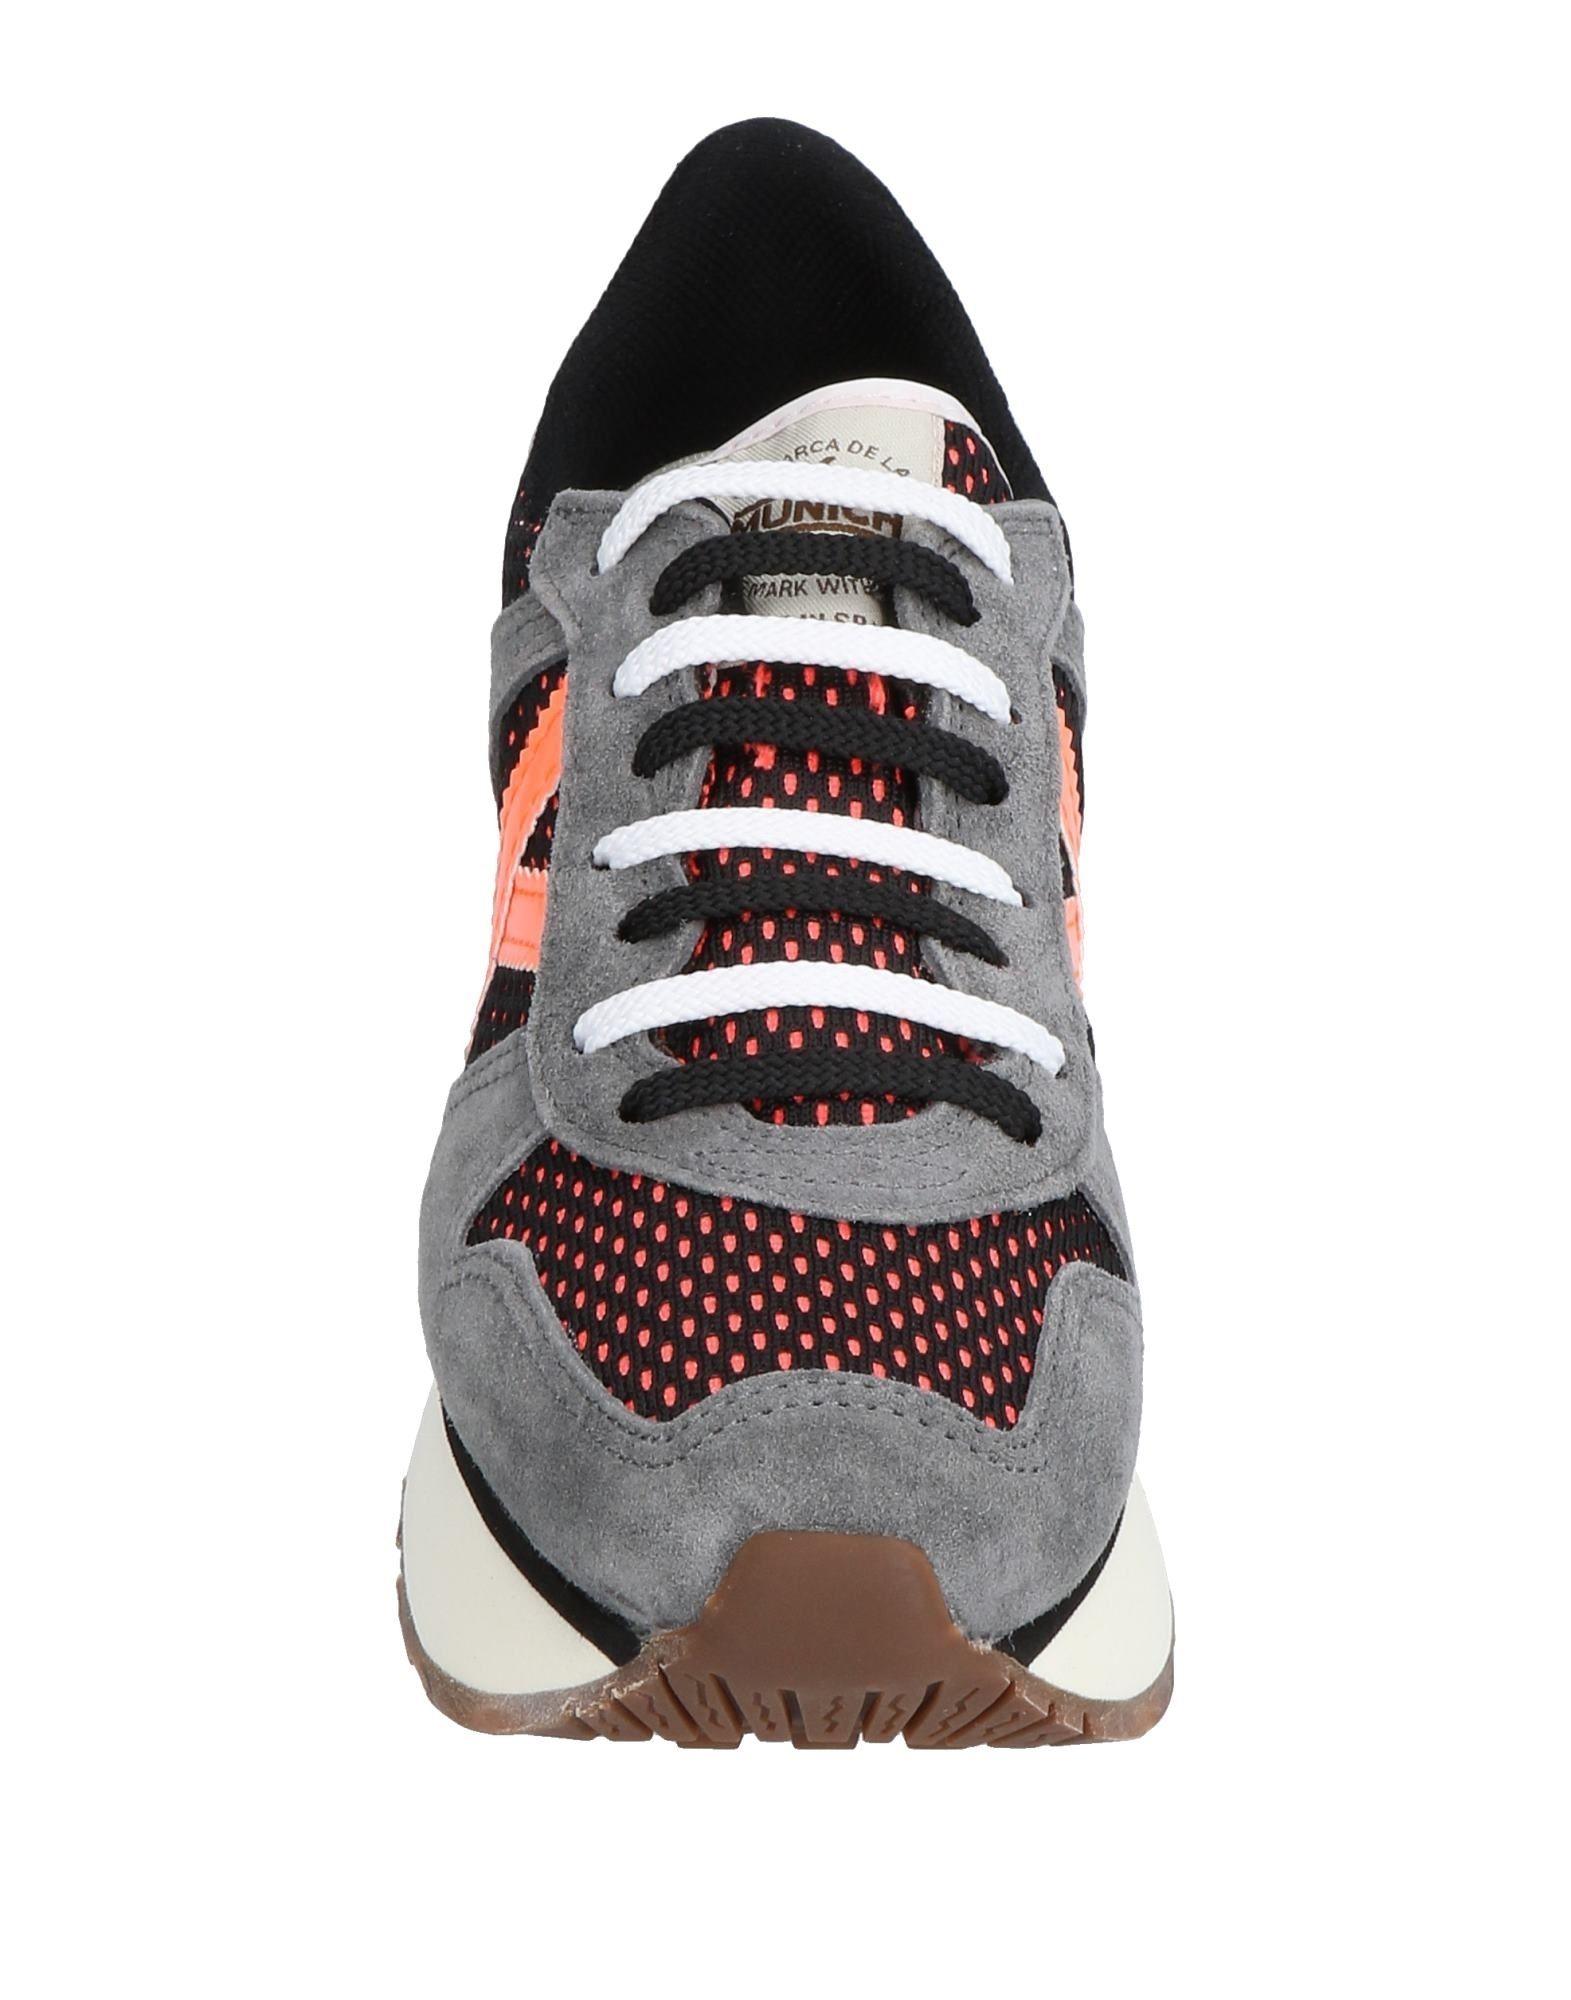 Munich Sneakers Damen  11446355GB Gute Qualität beliebte Schuhe